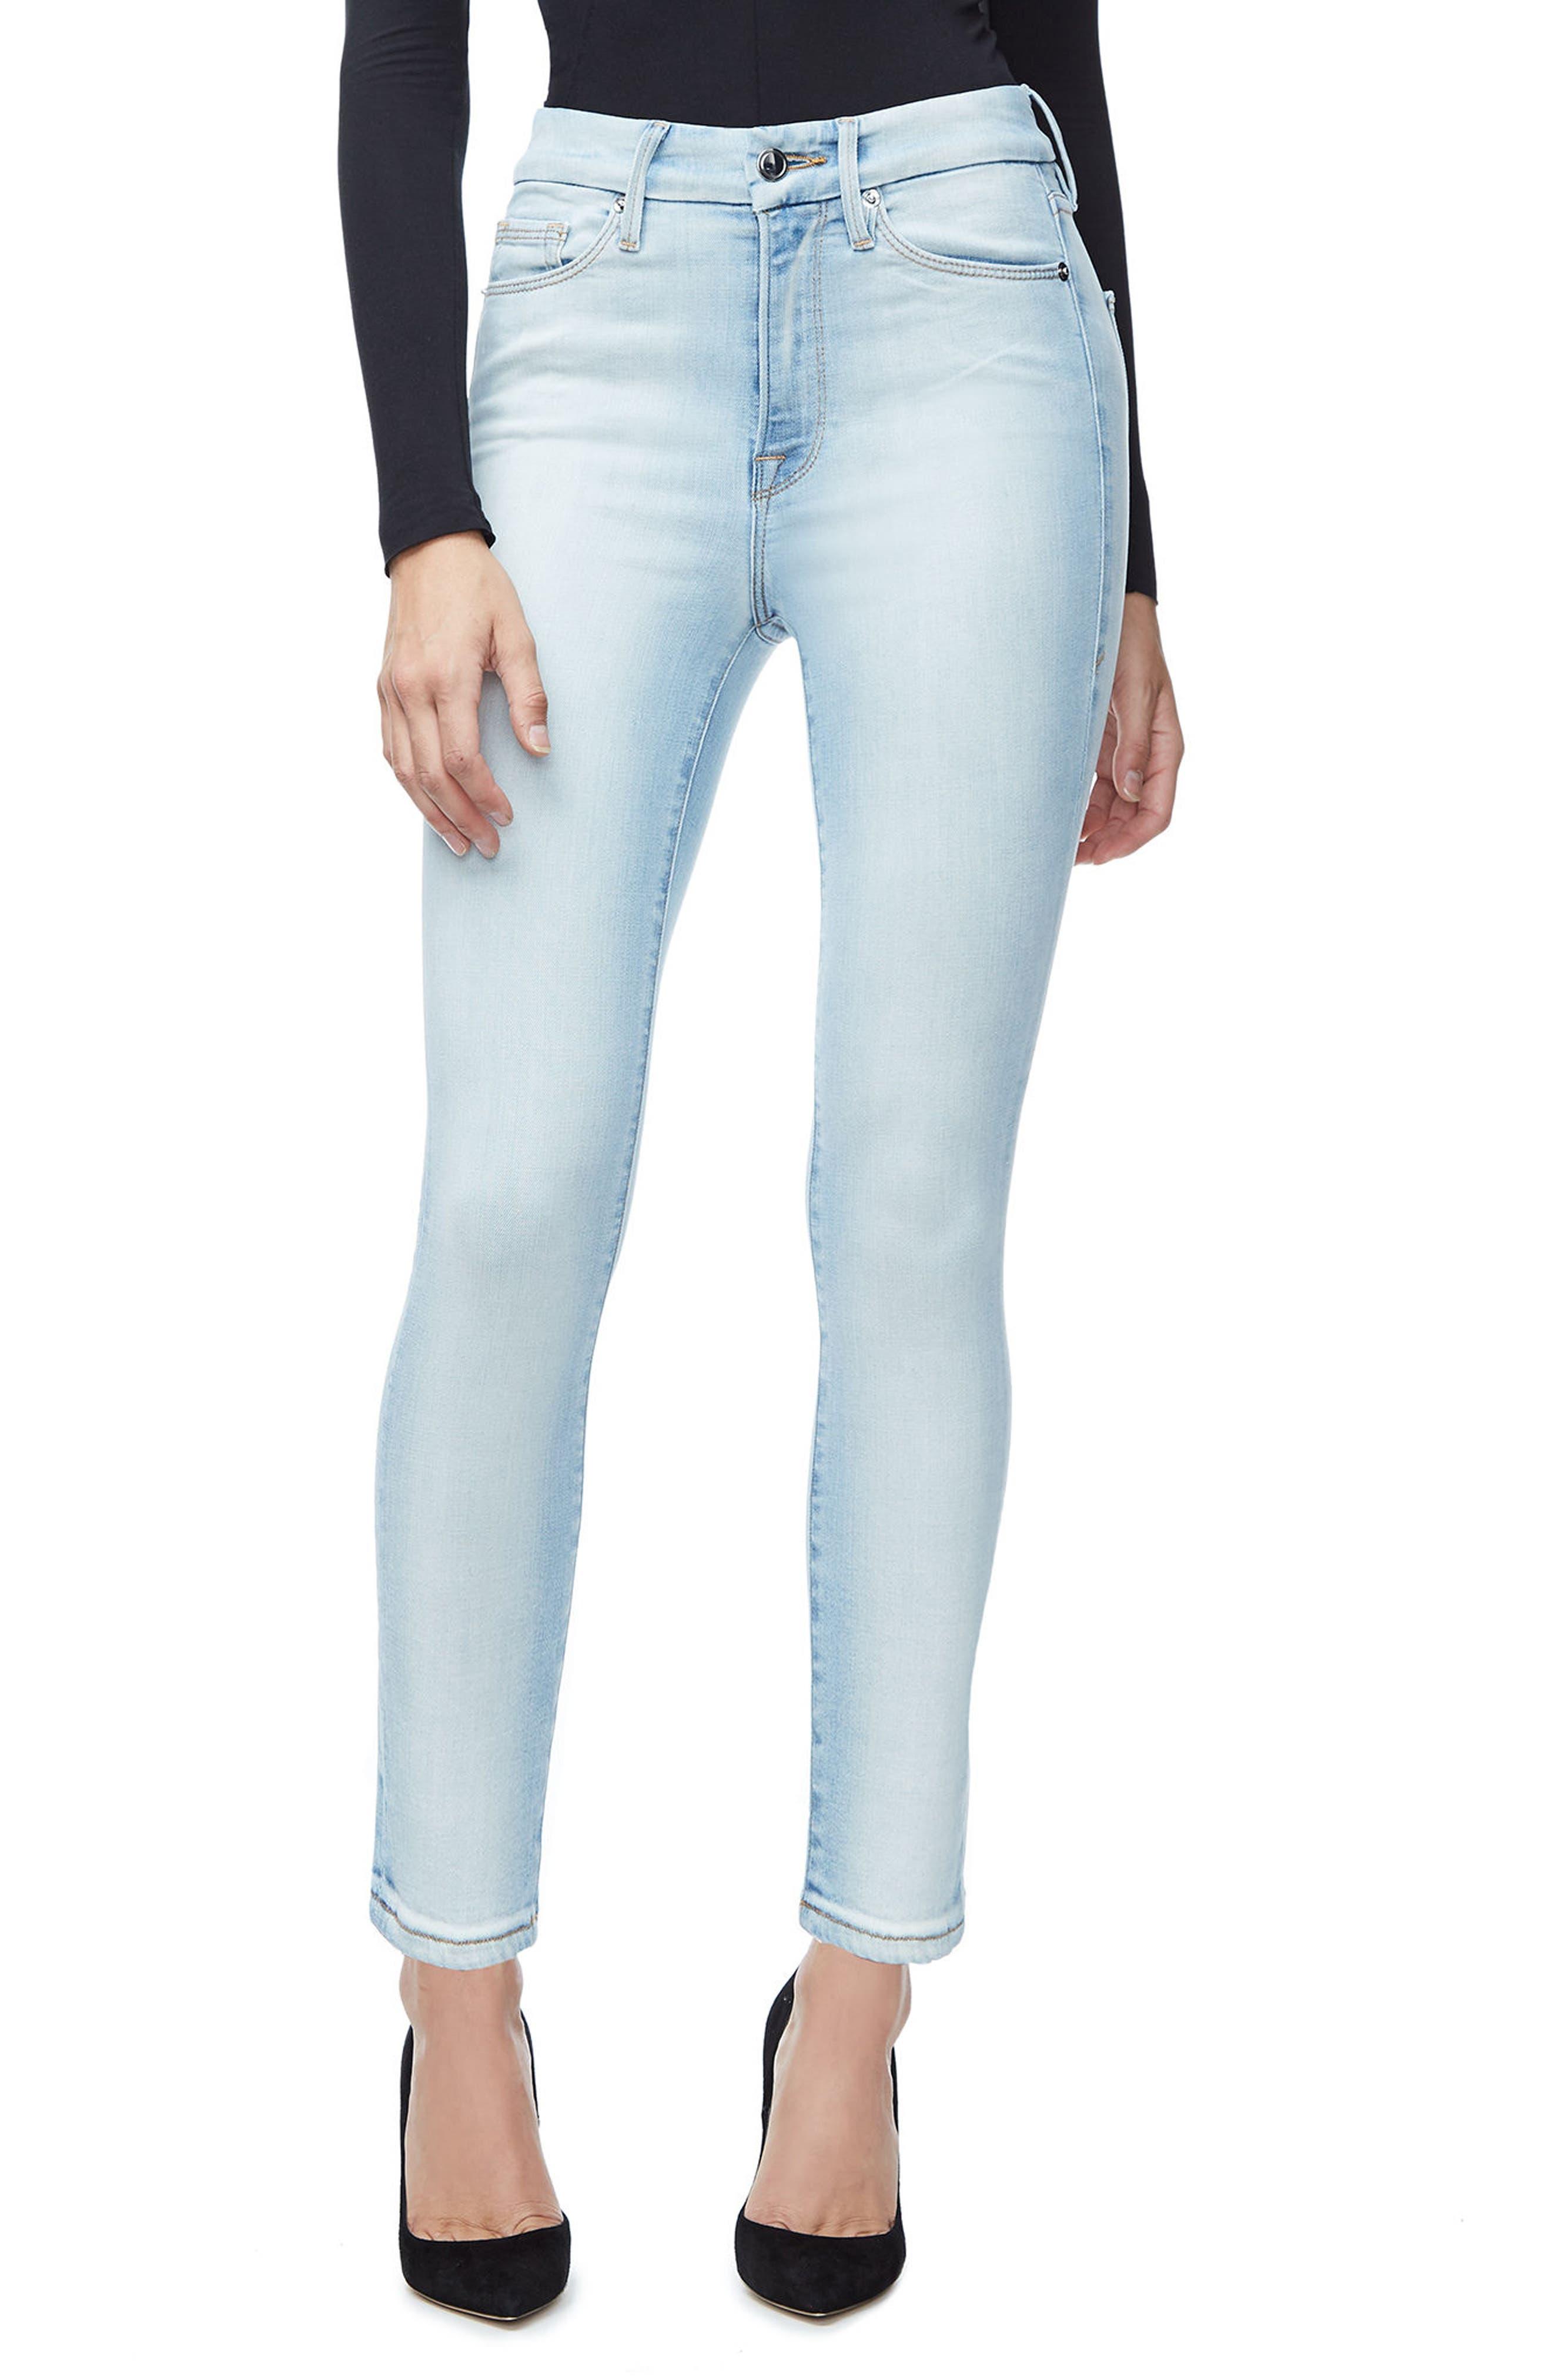 Main Image - Good American Good Waist Skinny Jeans (Blue 116) (Regular & Plus Size)